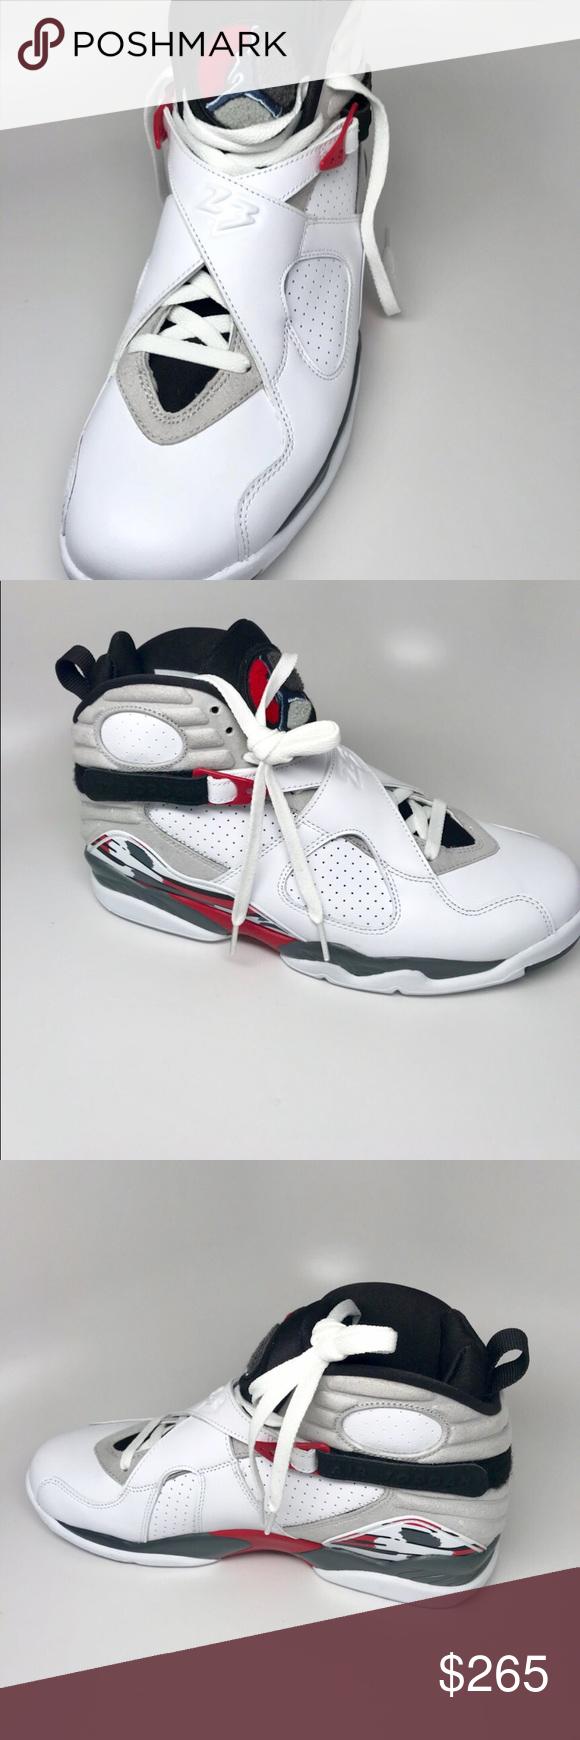 "22f23af8be21 🆕Air Jordan Retro 8 ""Bugs Bunny""‼️NWB Air Jordan retro 8 Bugs Bunny. A highly  sought after shoe and rightly so! Michael Jordan s 20th anniversary of his  ..."